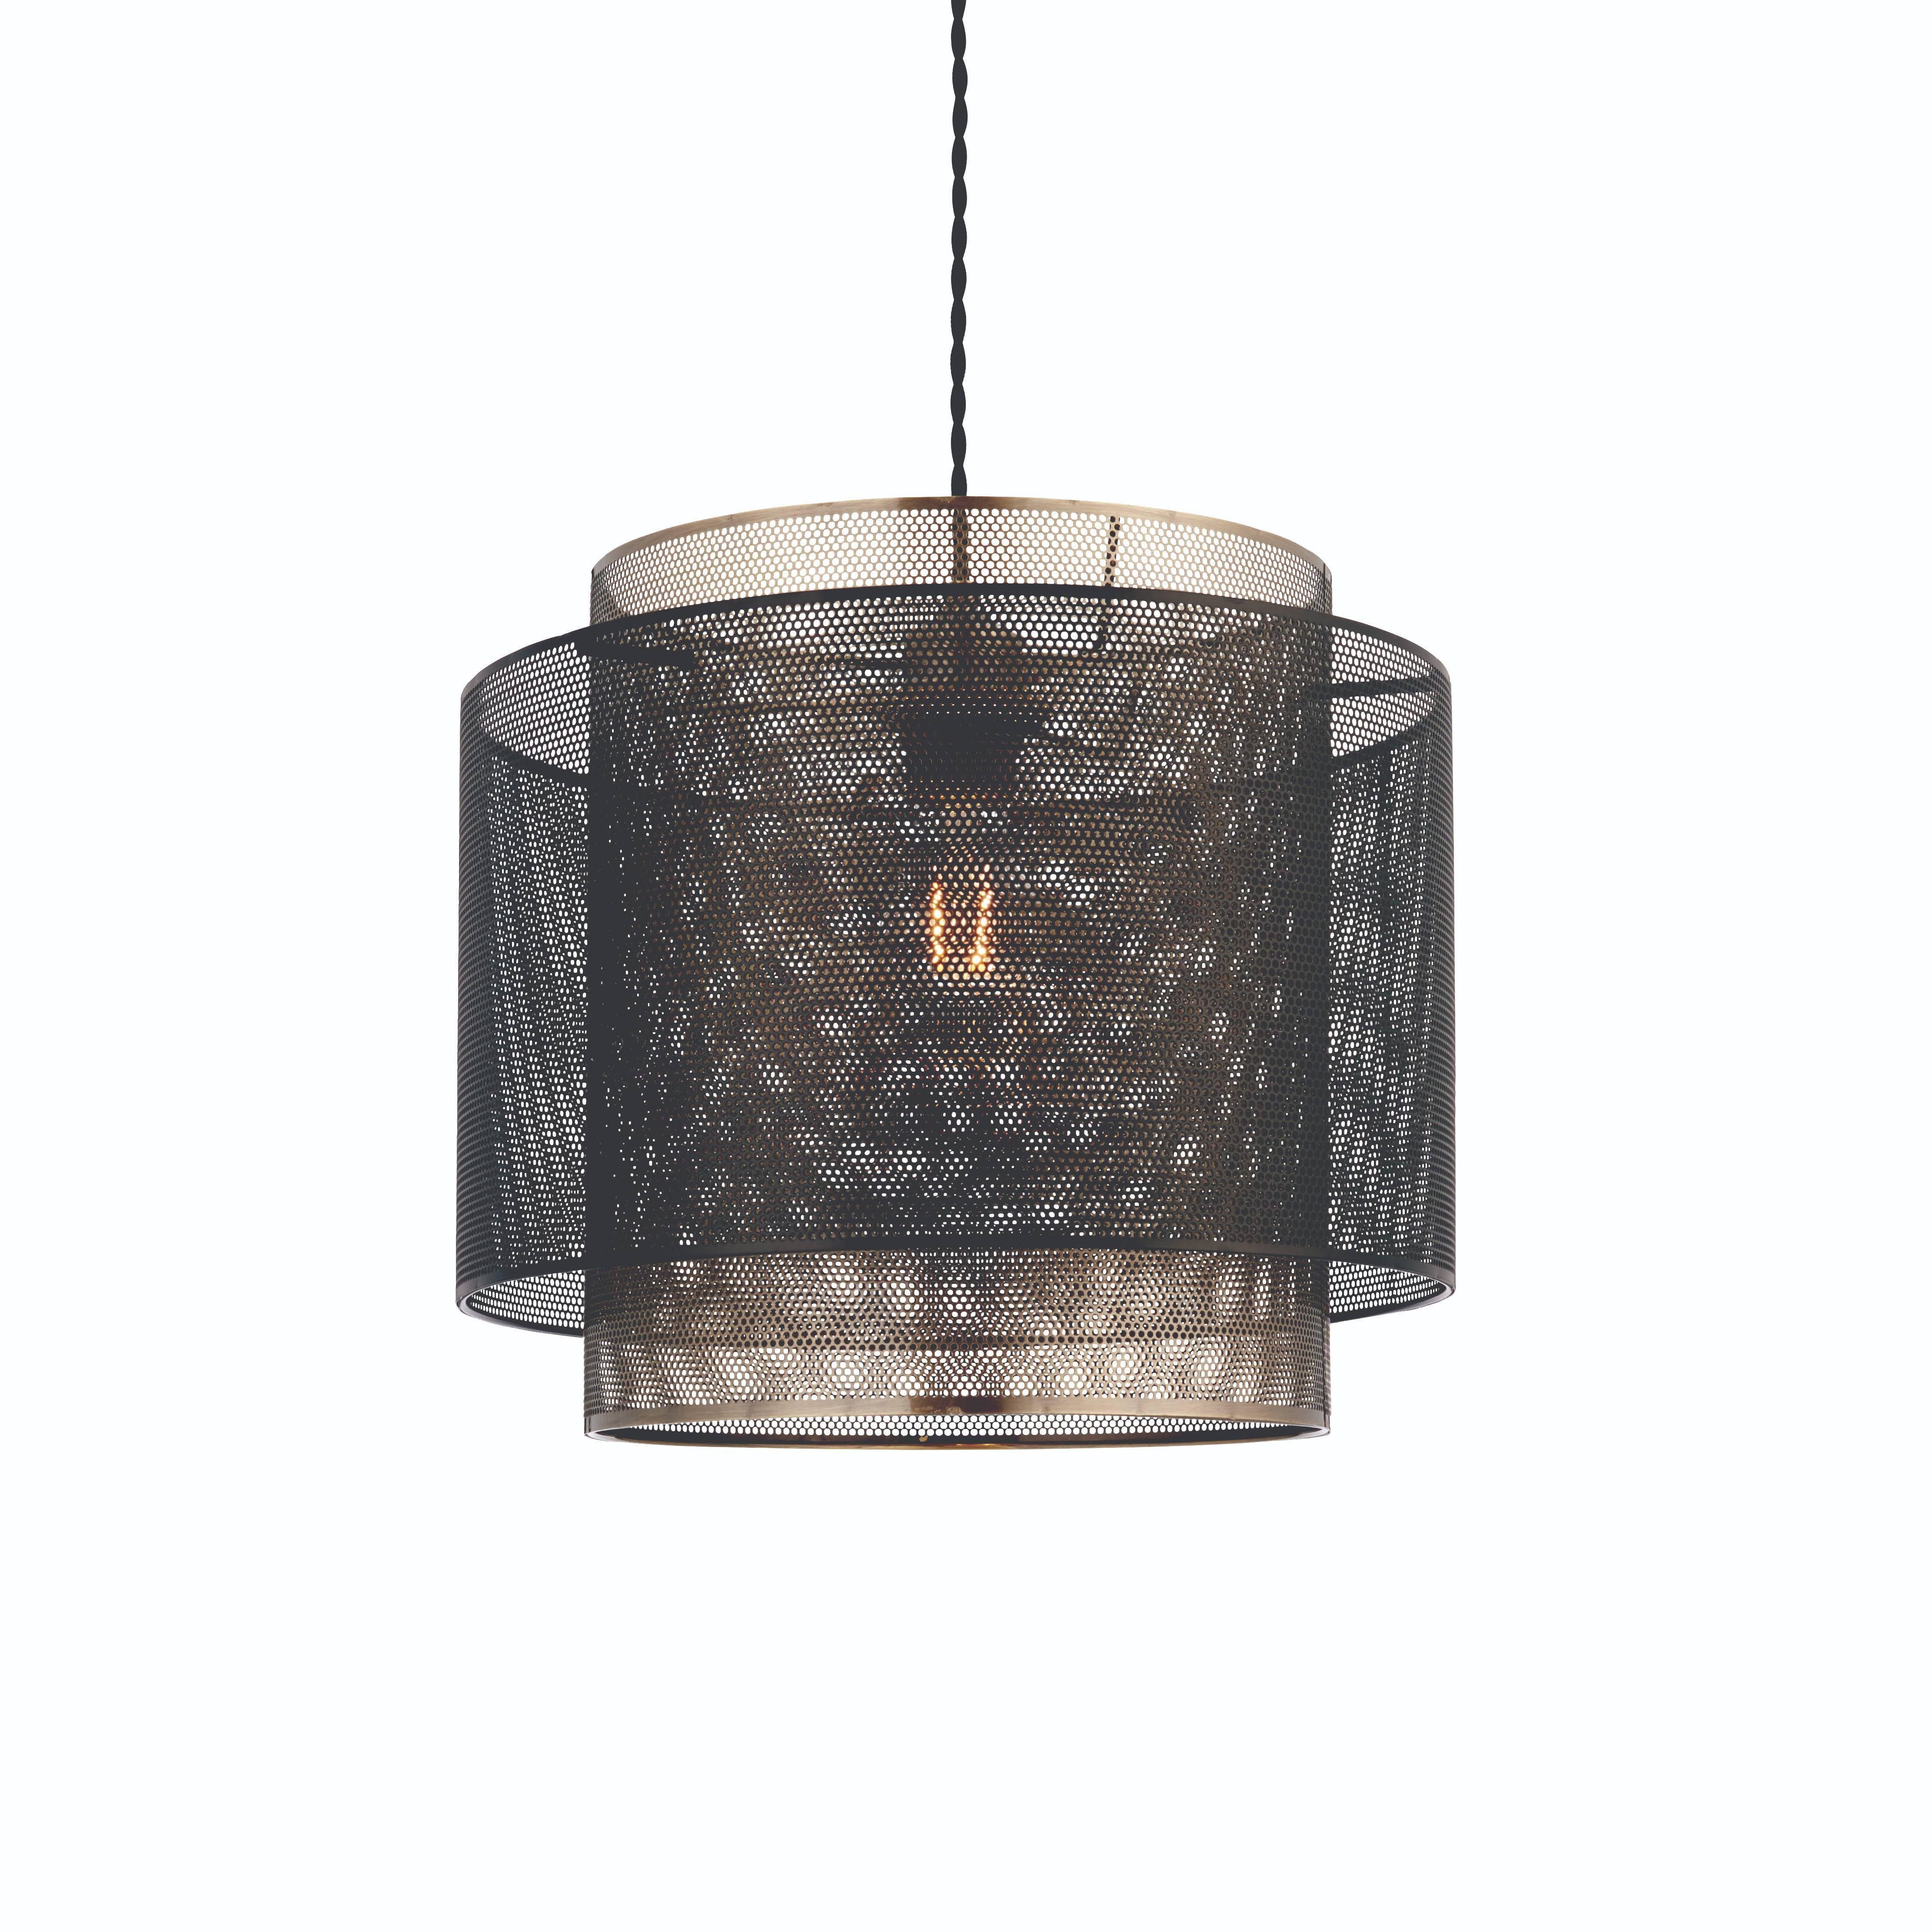 Endon 72829 Plexus Non Electric Pendant Antique Brass ... on Decorative Wall Sconces Non Electric Lights For Closets id=55031